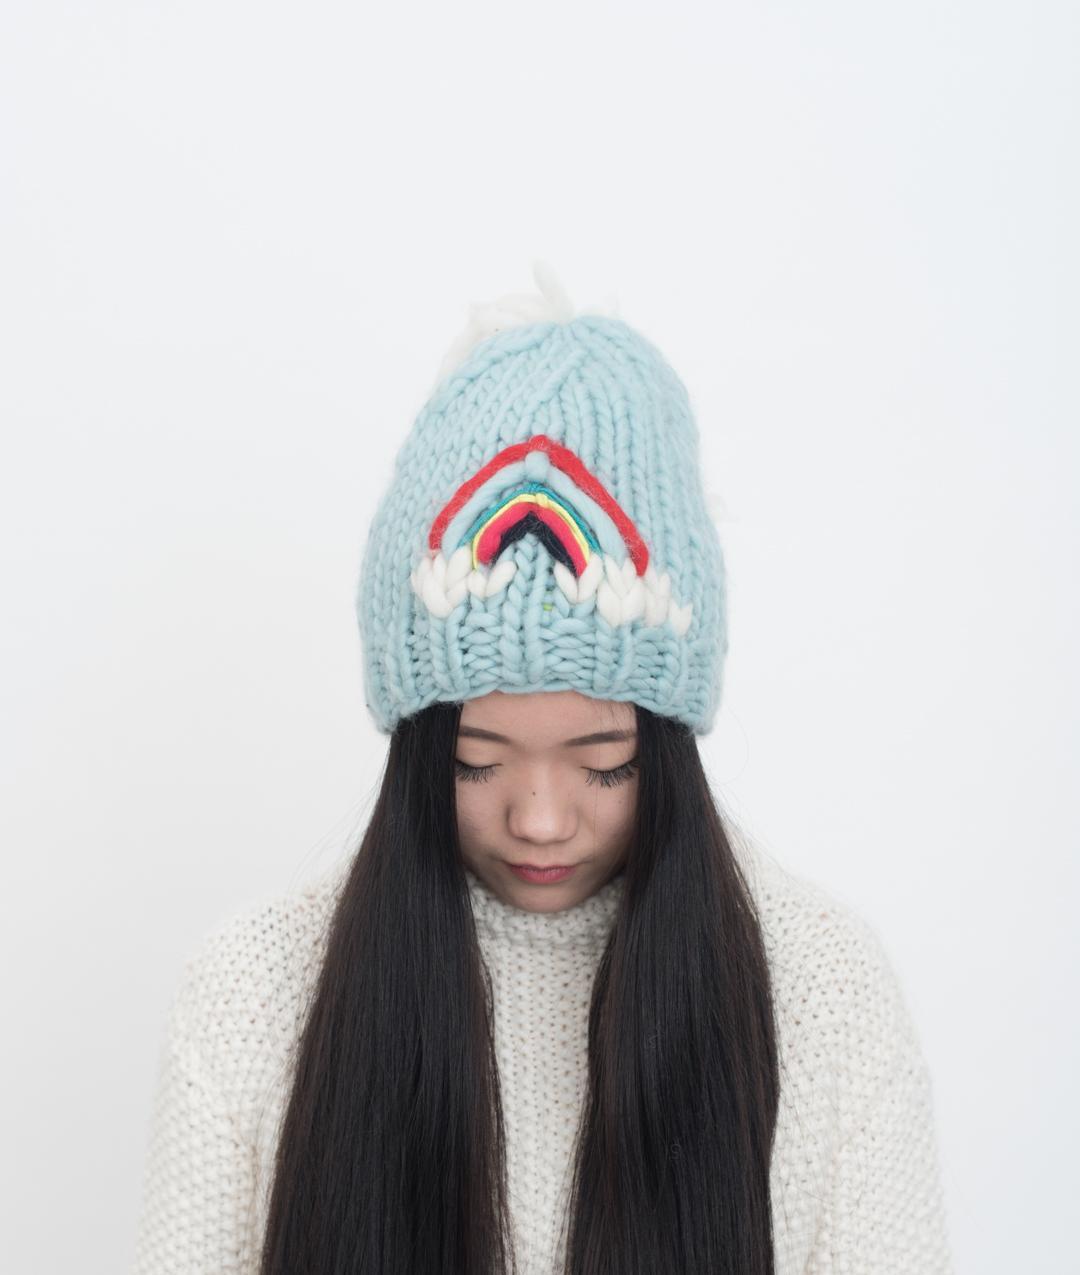 Hats and Beanies - Wool - Unicorn Beanie - 1